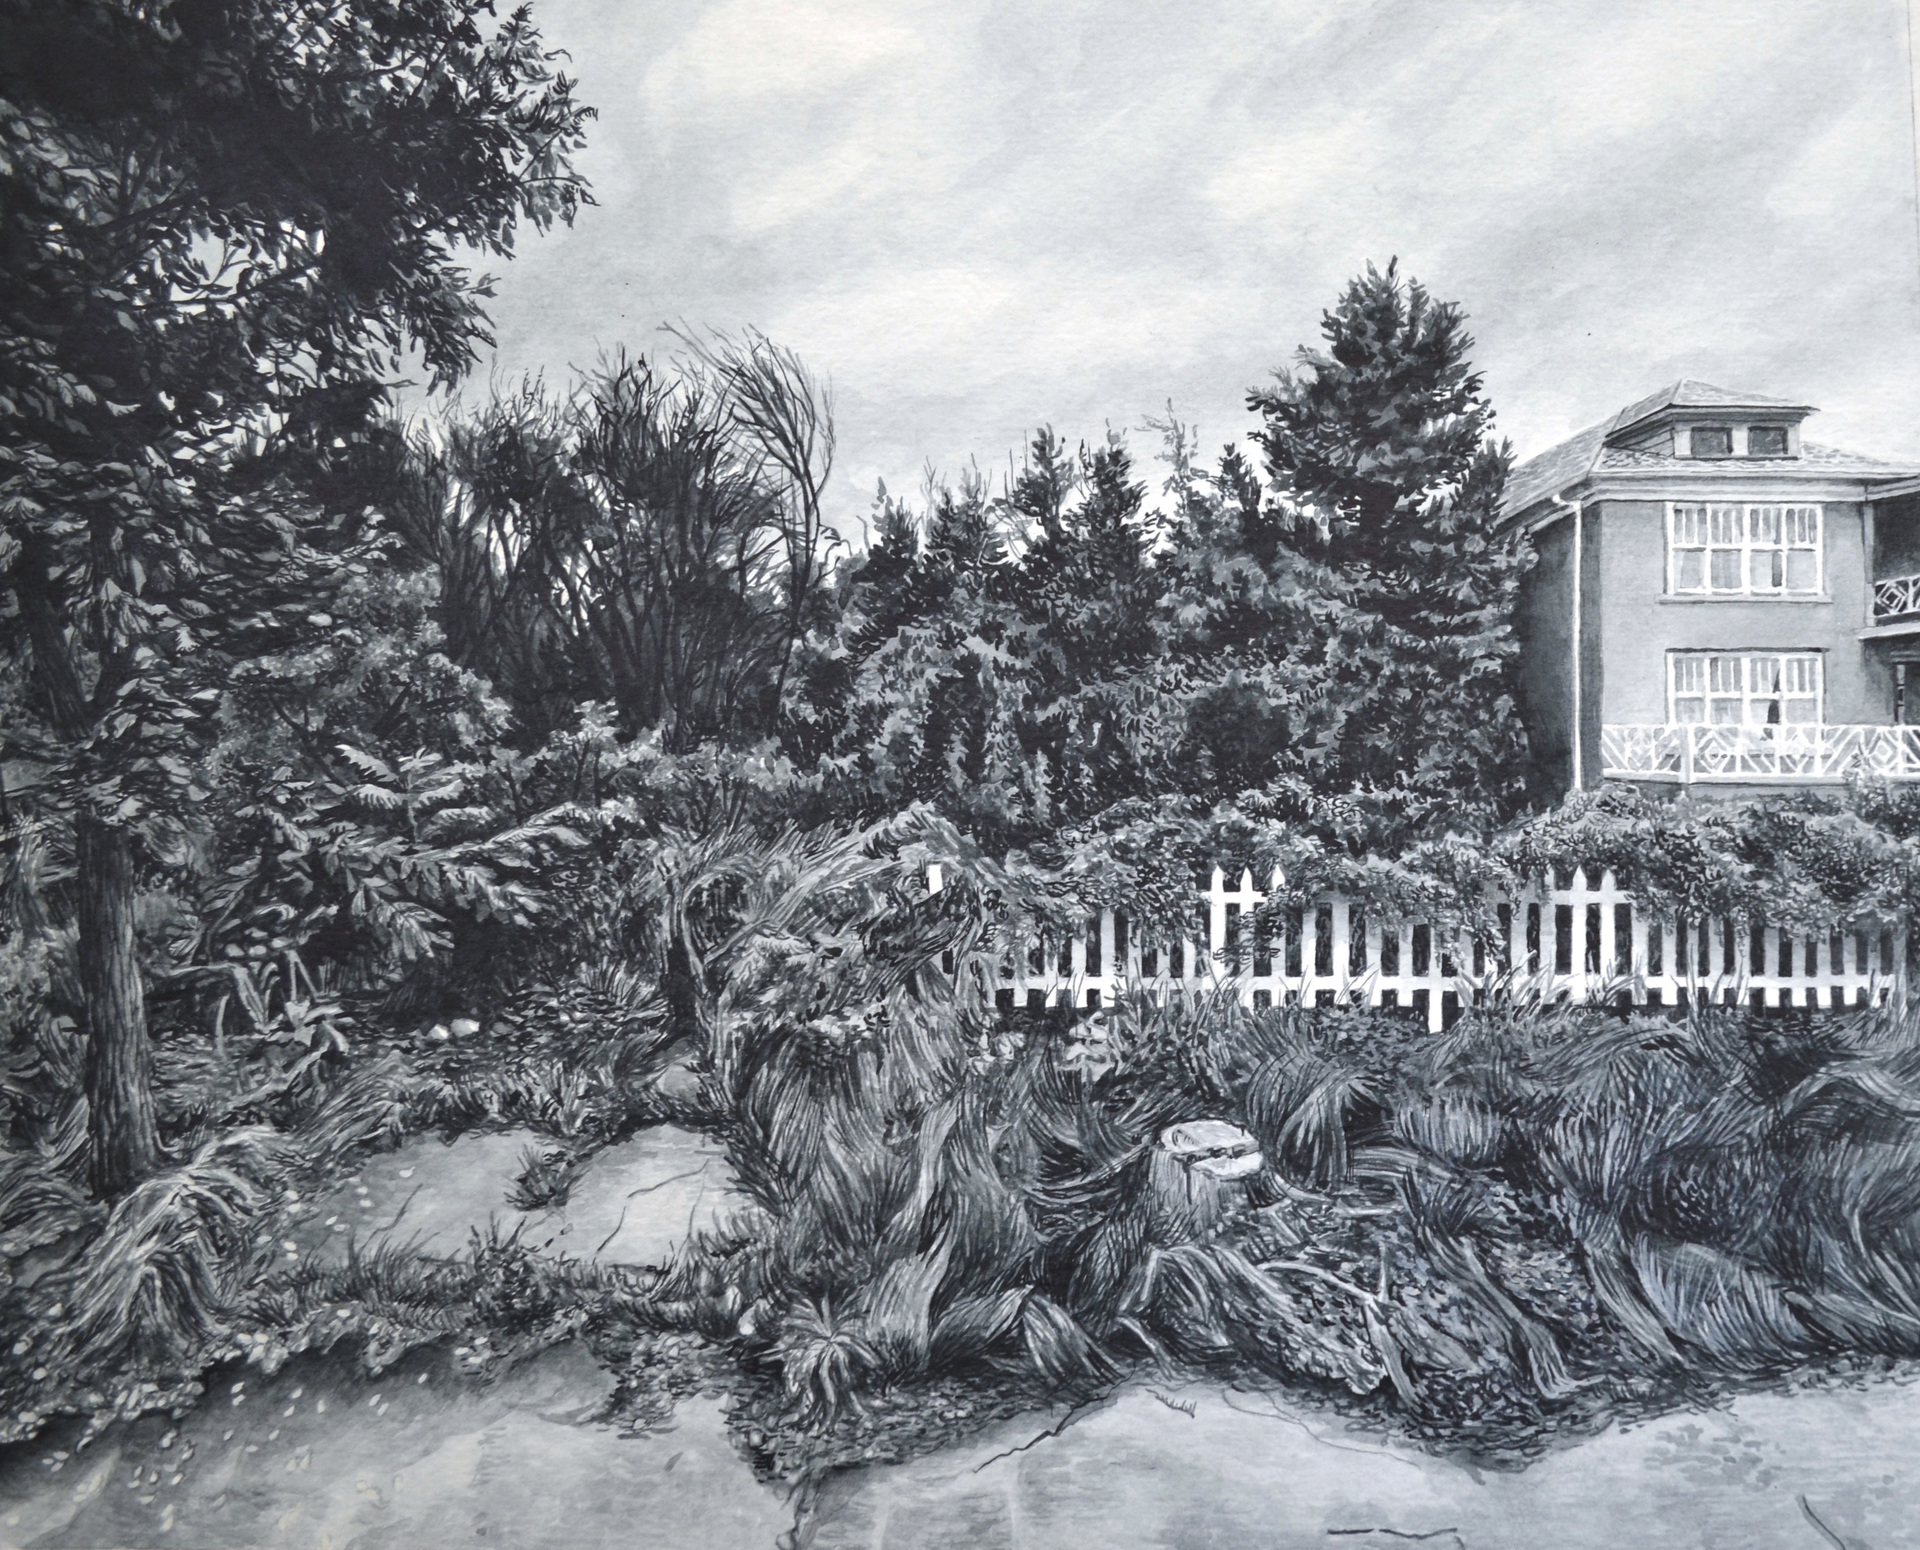 Whitney Sage, White Picket Fence, Homesickness Series